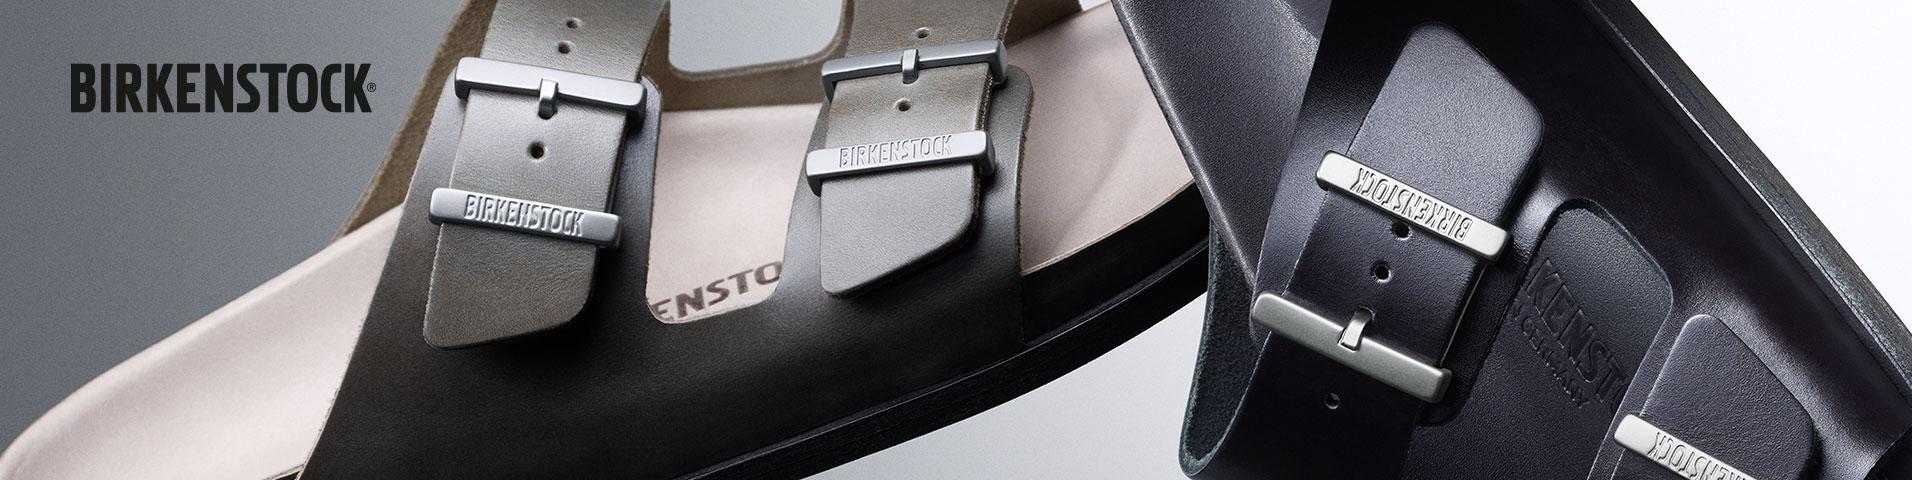 Scarpe aperte da uomo Birkenstock · SandaliInfraditoScarpe da mareCiabatte ZoccoliPantofole b98bc6c1b90